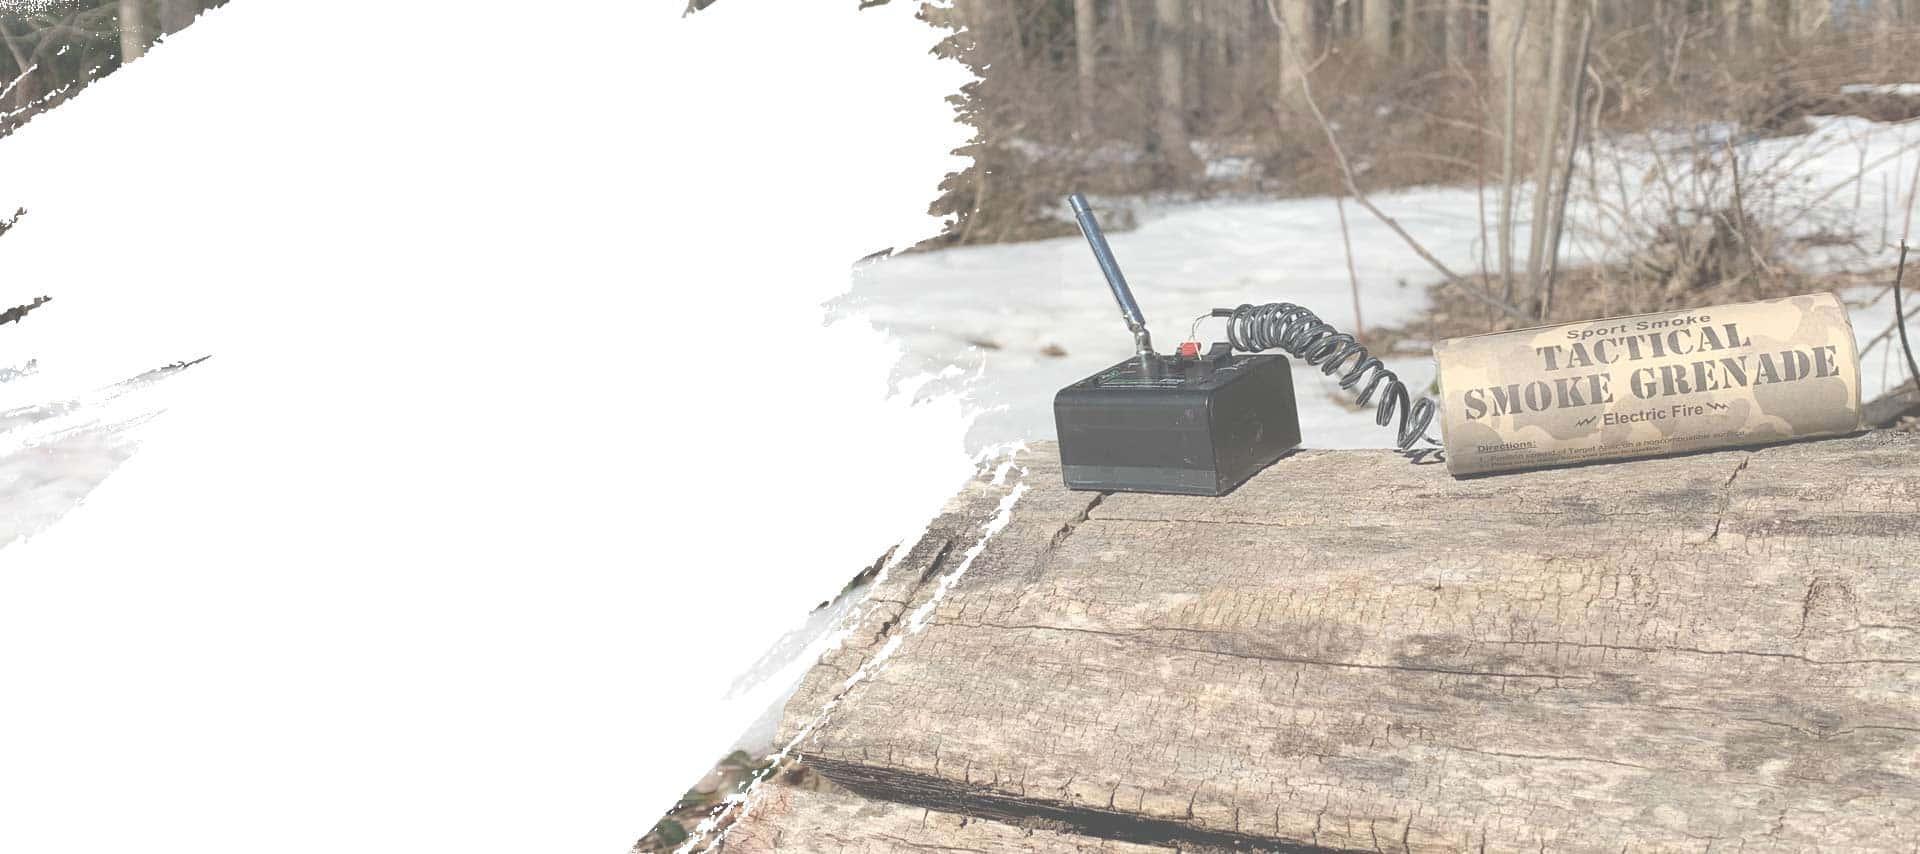 sport-smoke-background-remote-fire